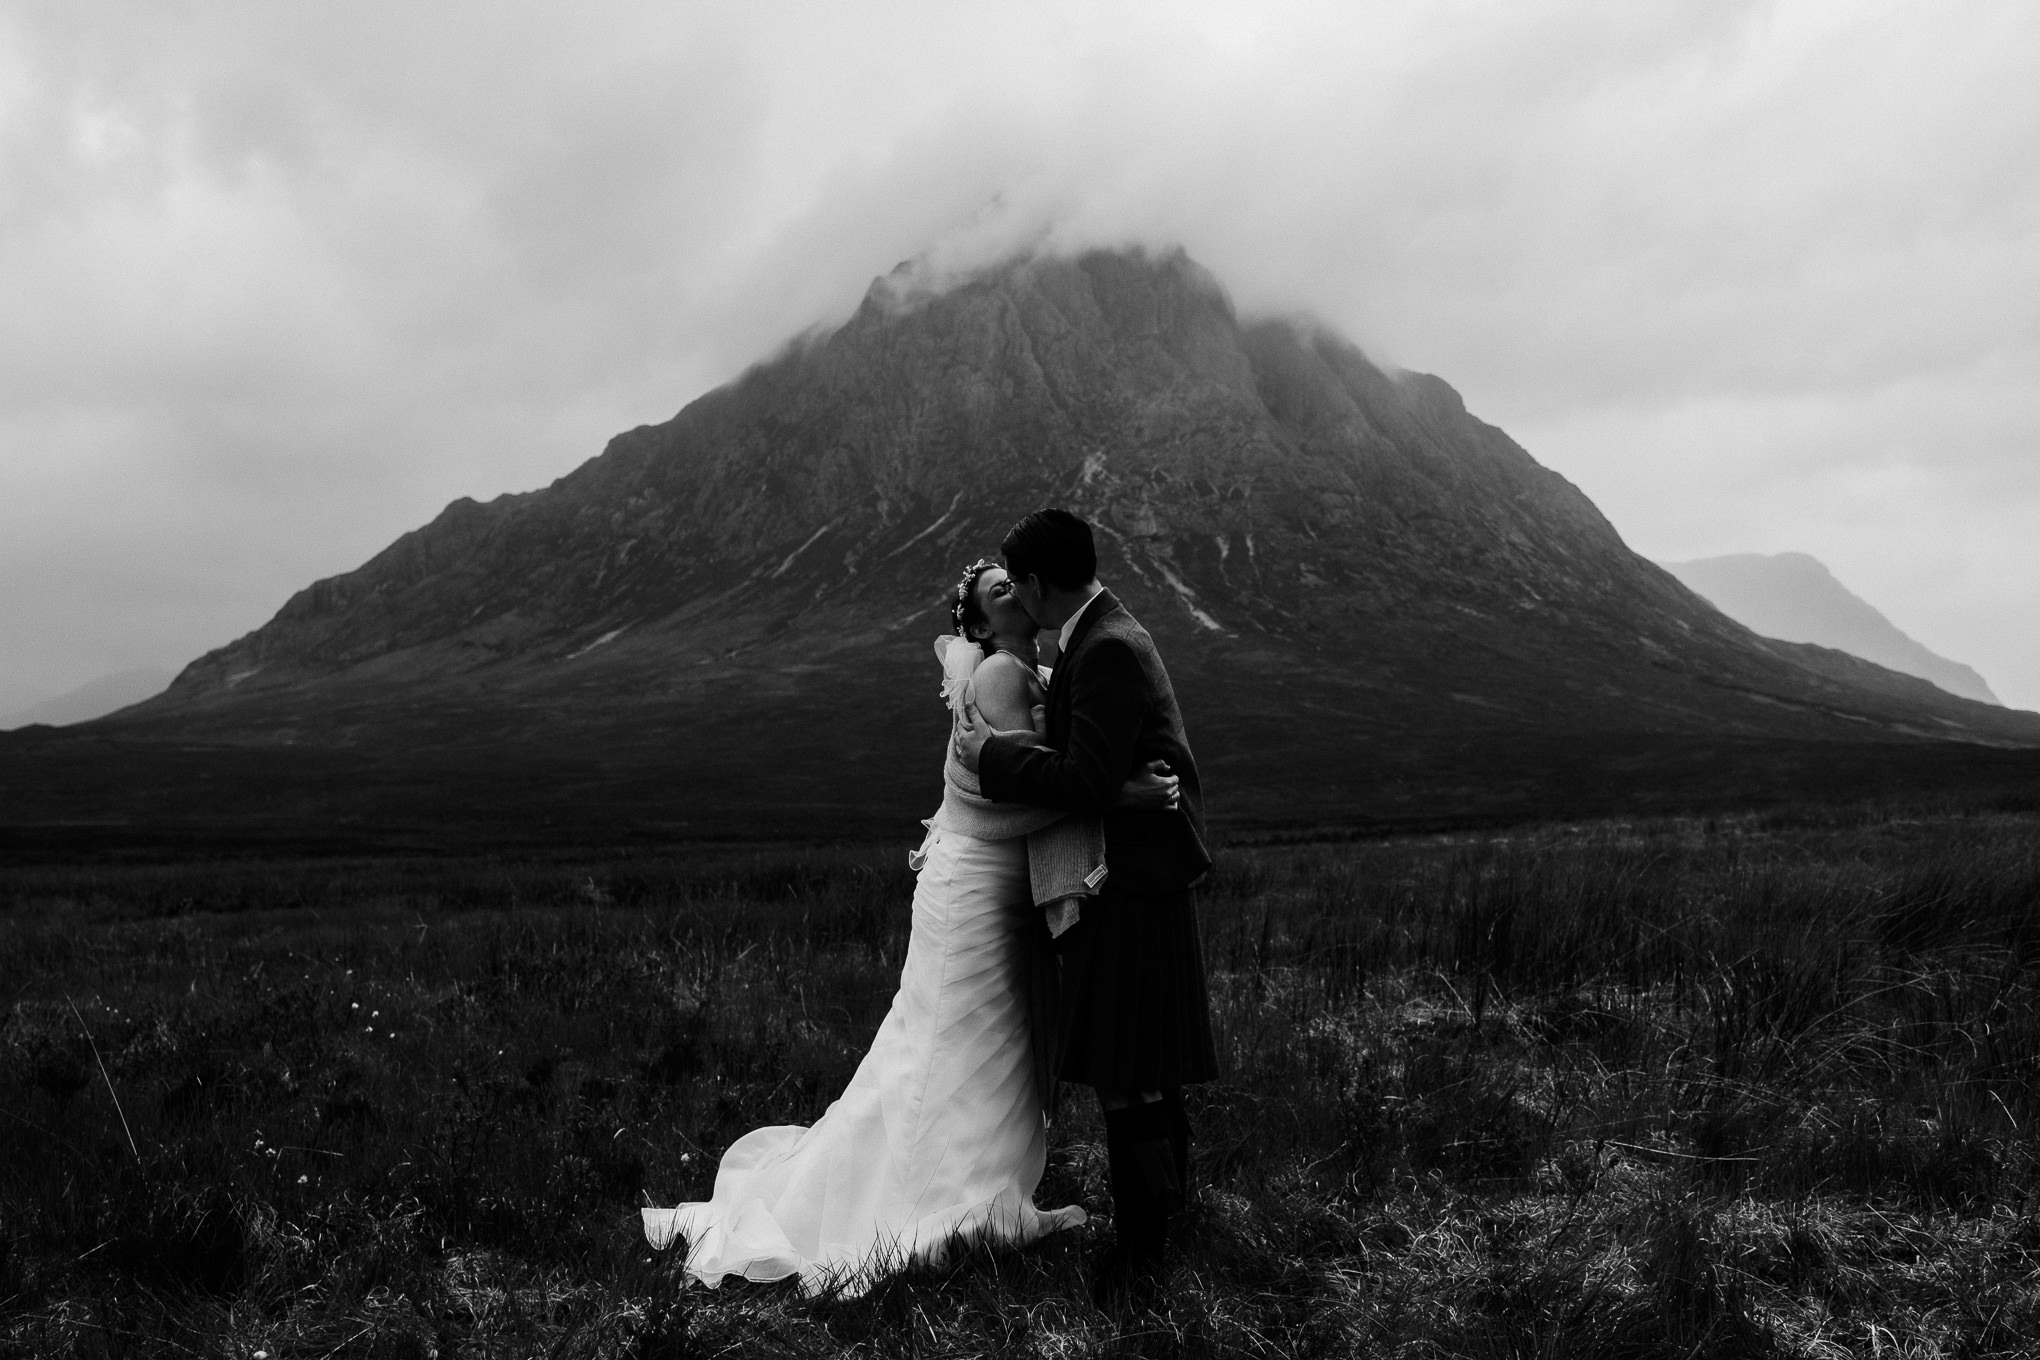 20170601_Glencoe Elopement Wedding_002.jpg